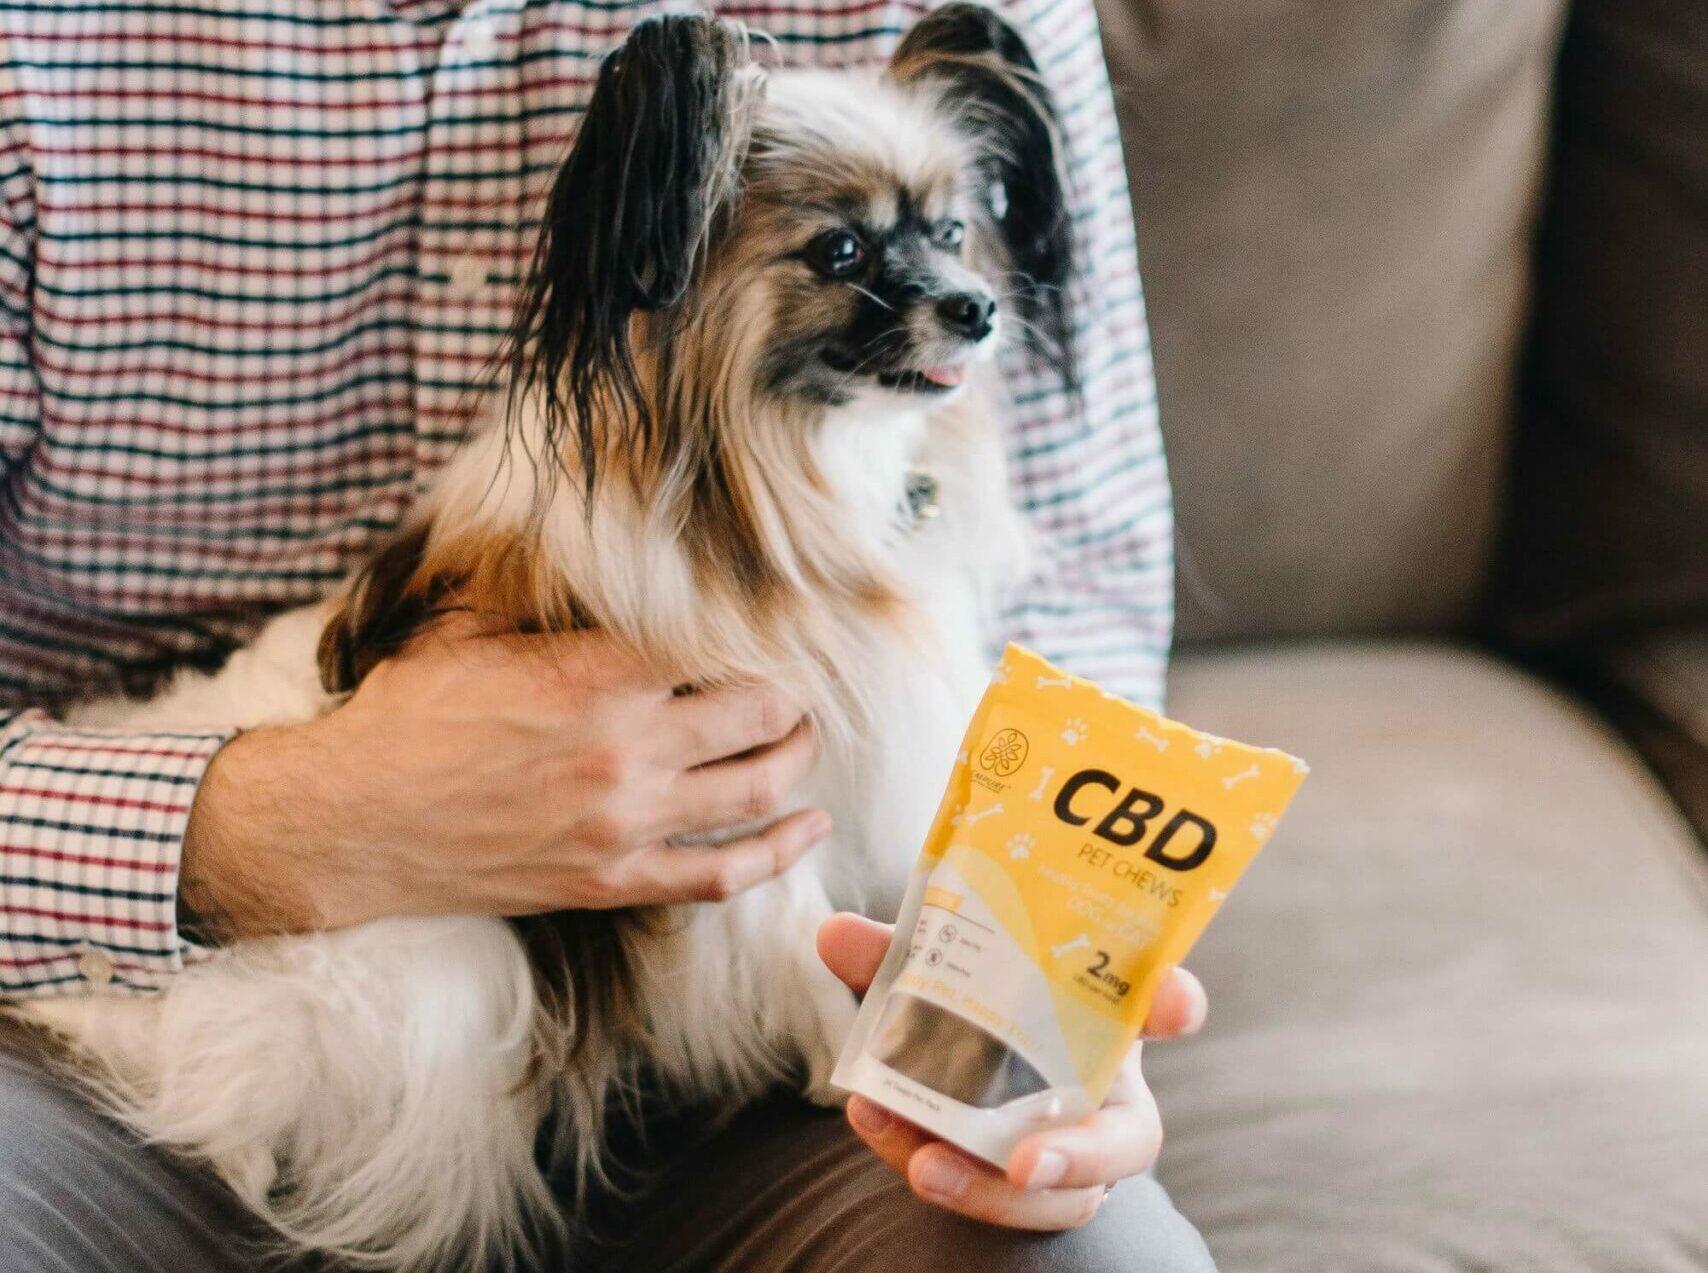 dog sitting on human lap, hand holding CBD dog treats